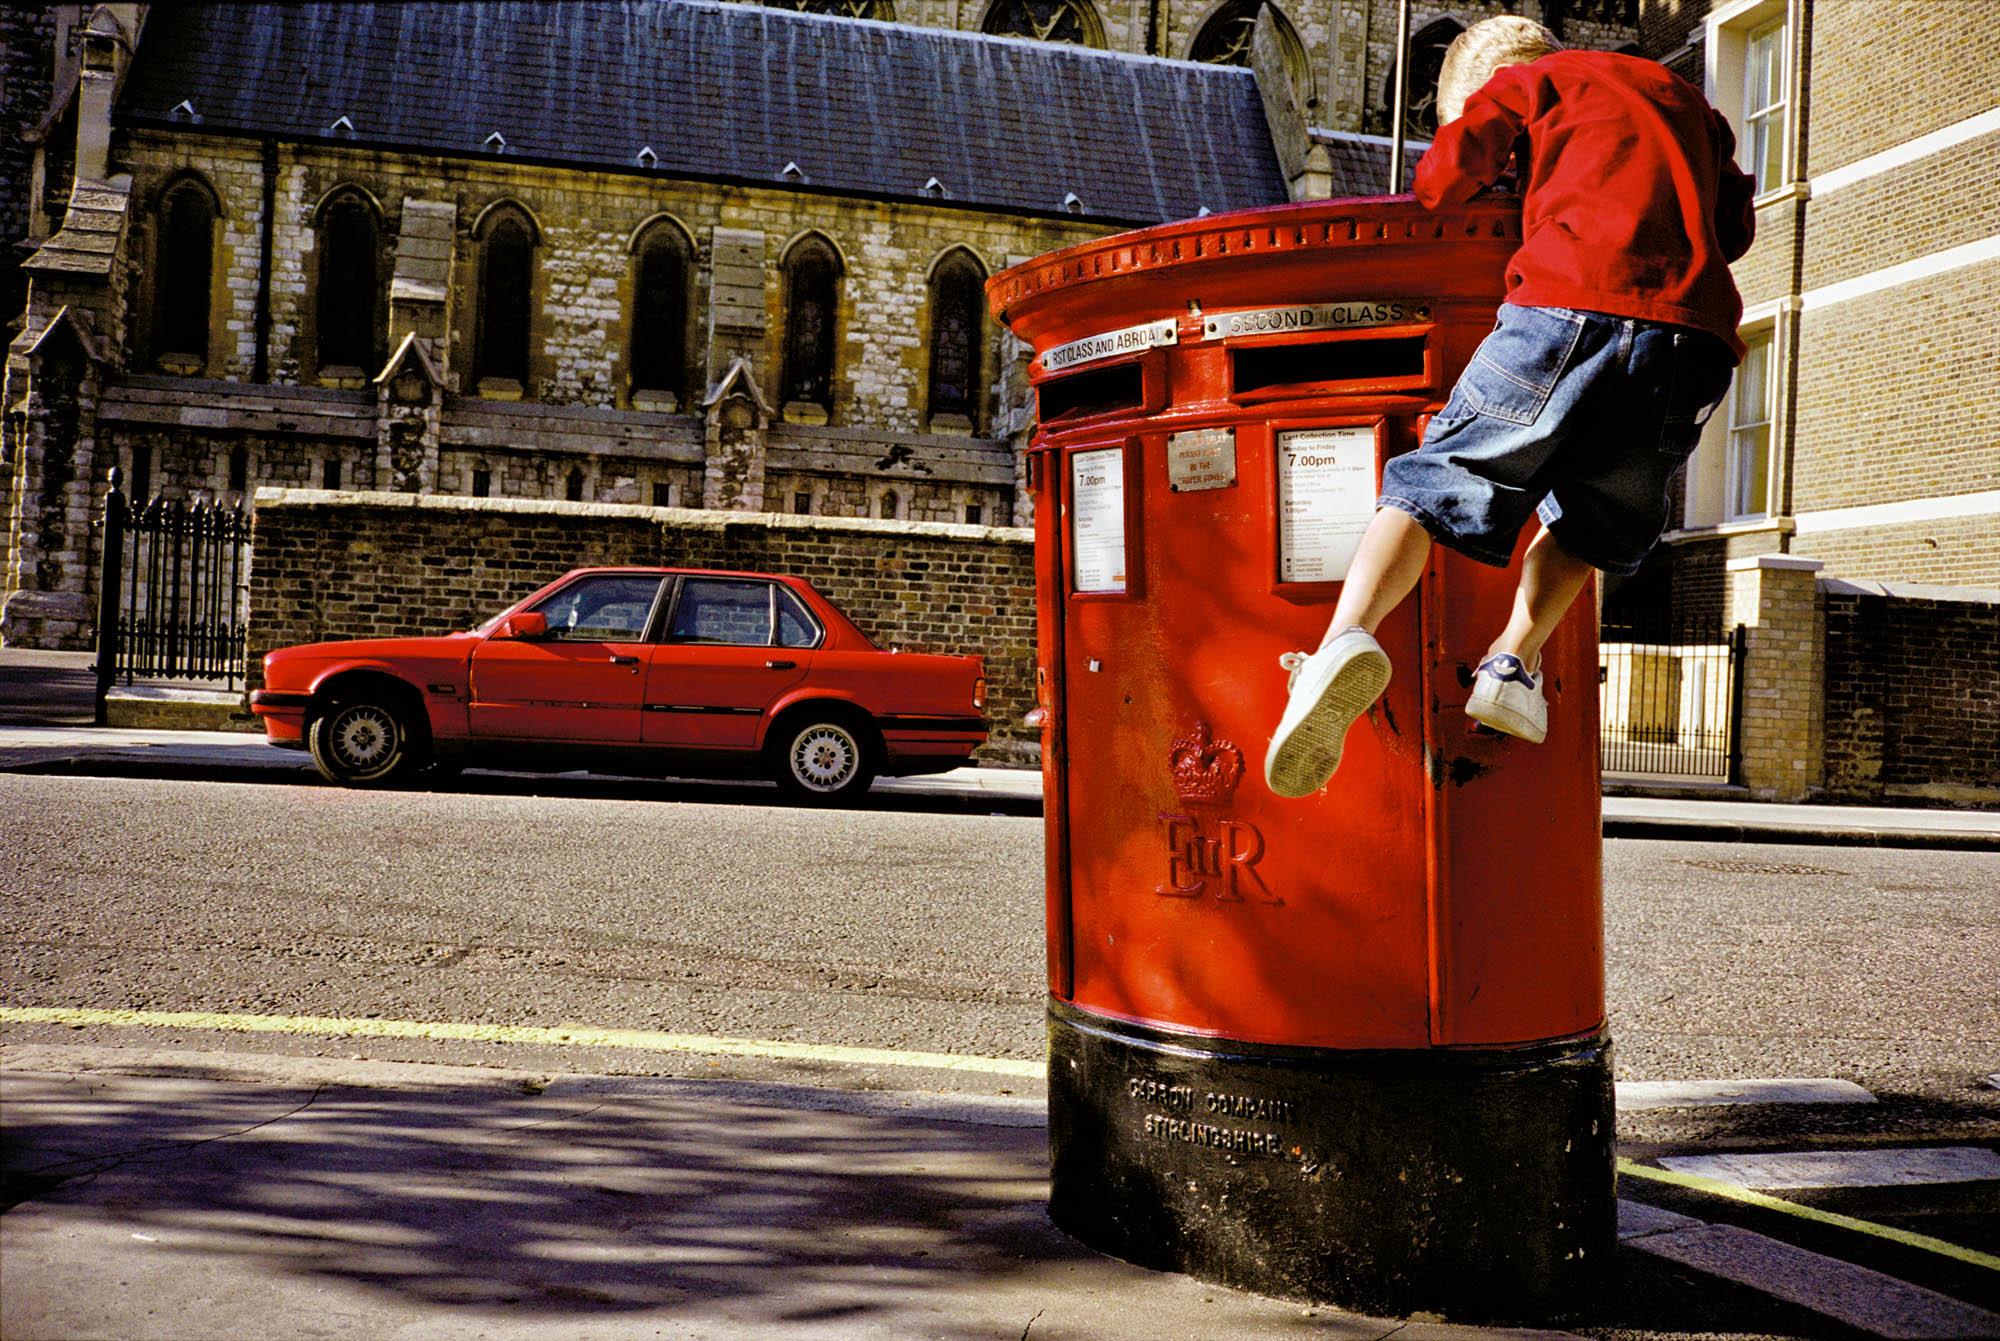 Photo London 2016: Street Photography Focus